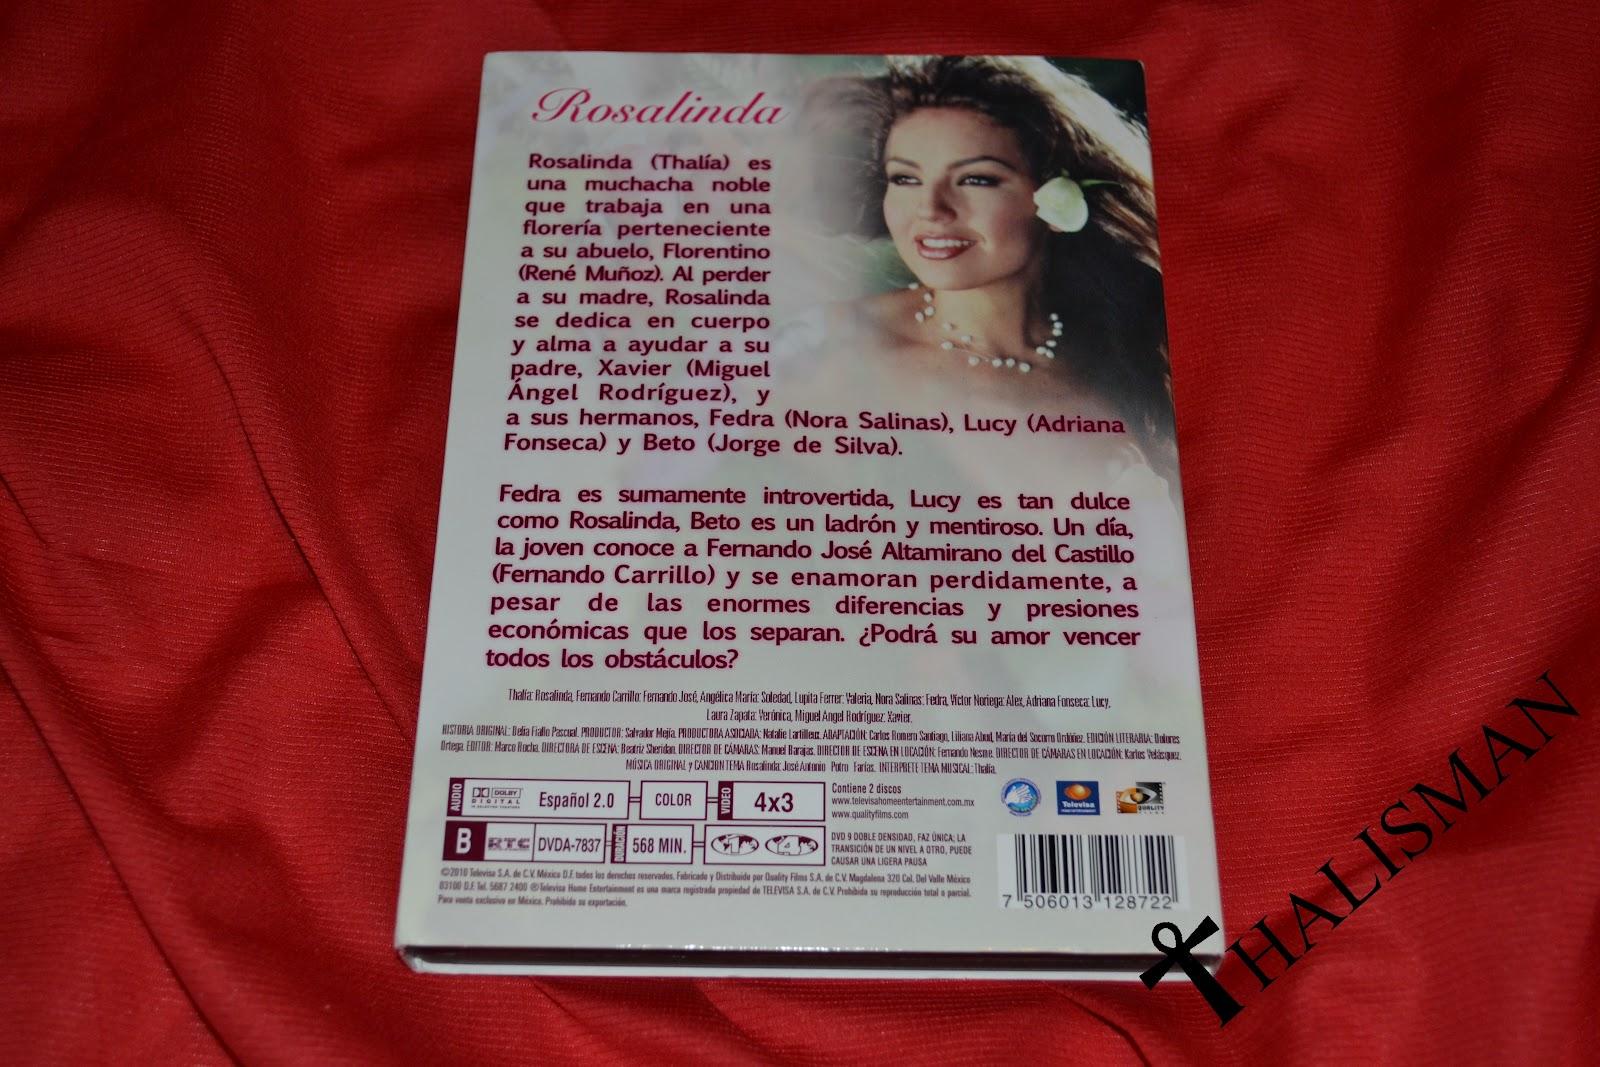 Museo Thalía en Nebraska: DVD - Rosalinda - Mexico